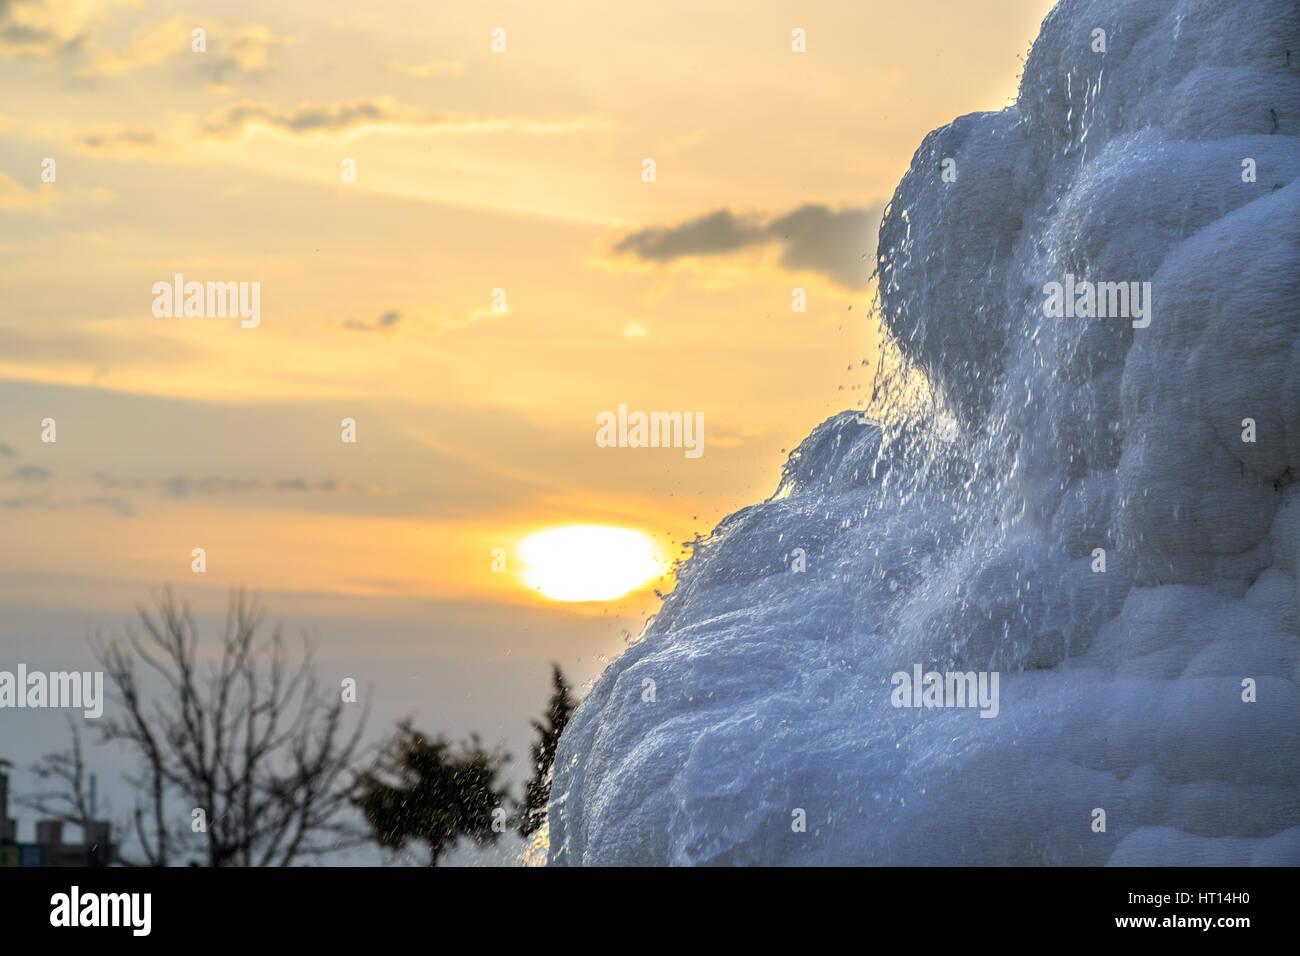 Pamukkale Travertin Becken während des Sonnenuntergangs Stockbild